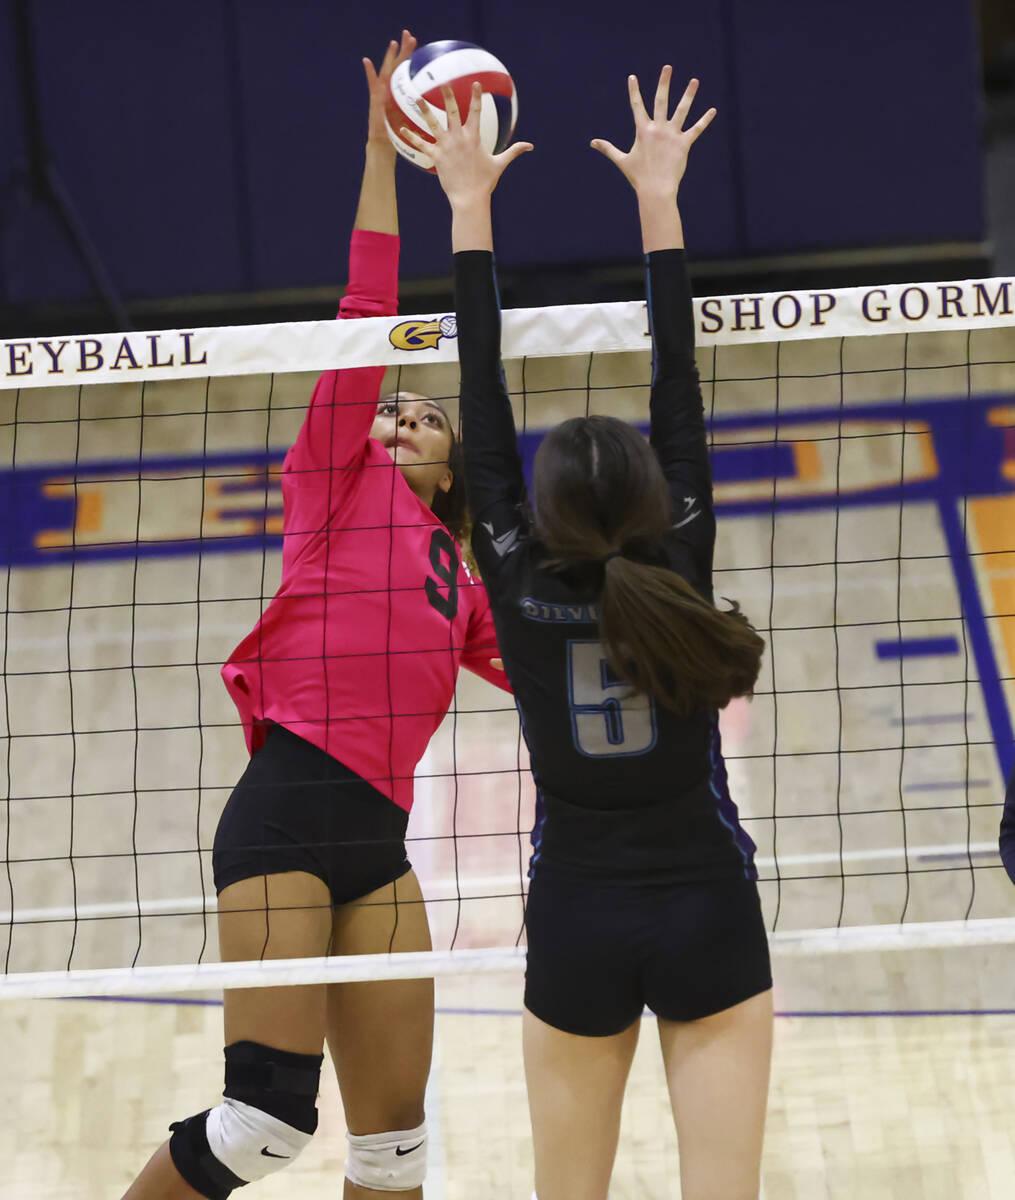 Bishop Gorman's outside hitter Imani Dambreville (9) sends the ball over the net as Silverado's ...